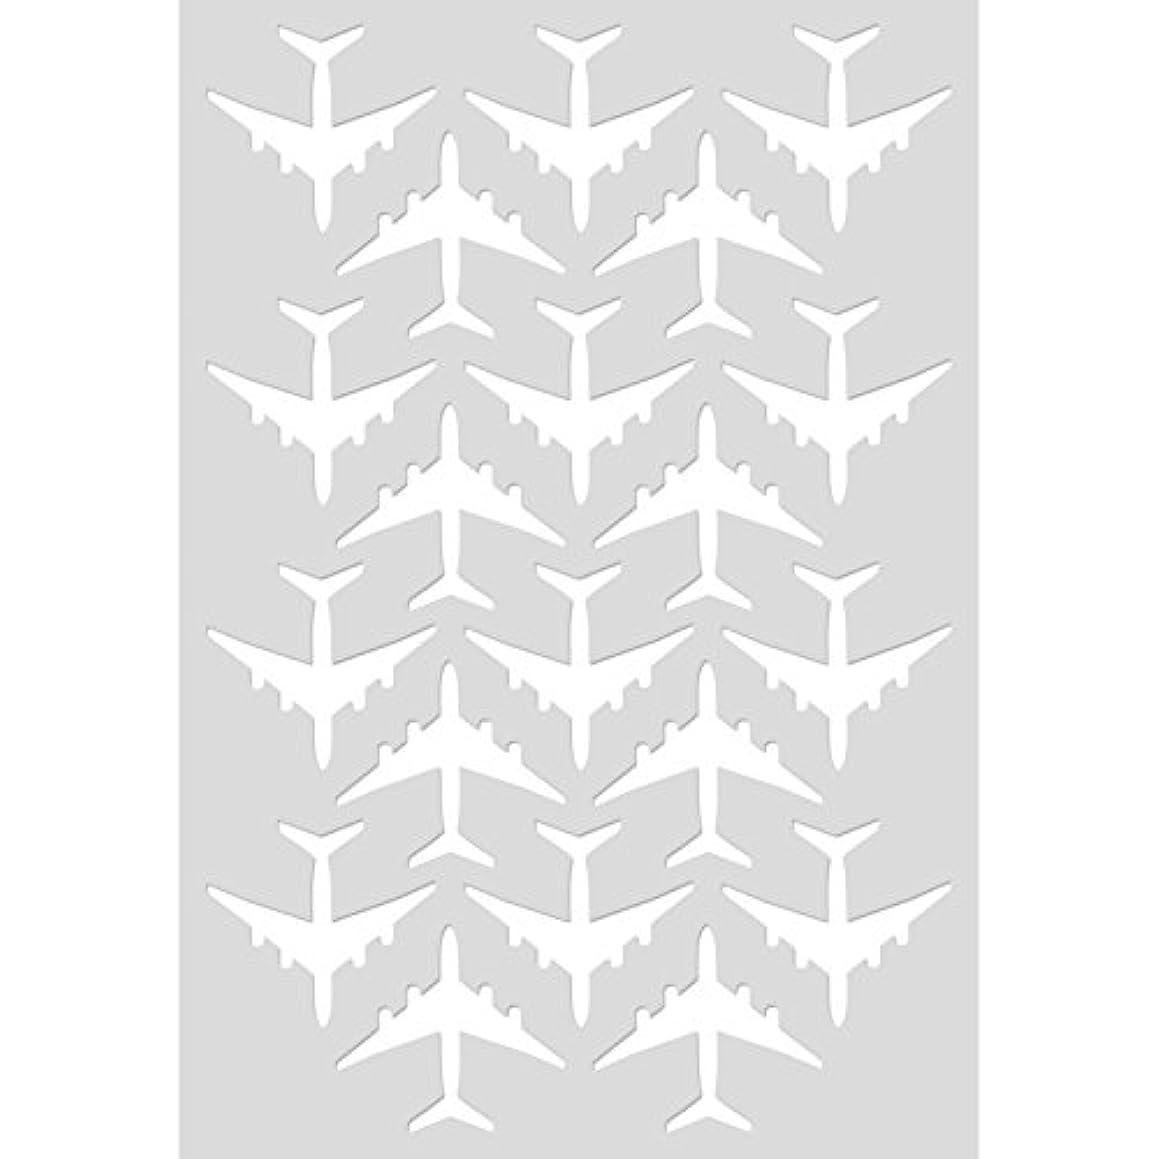 Kaisercraft Creations C6 Card Front Die 4